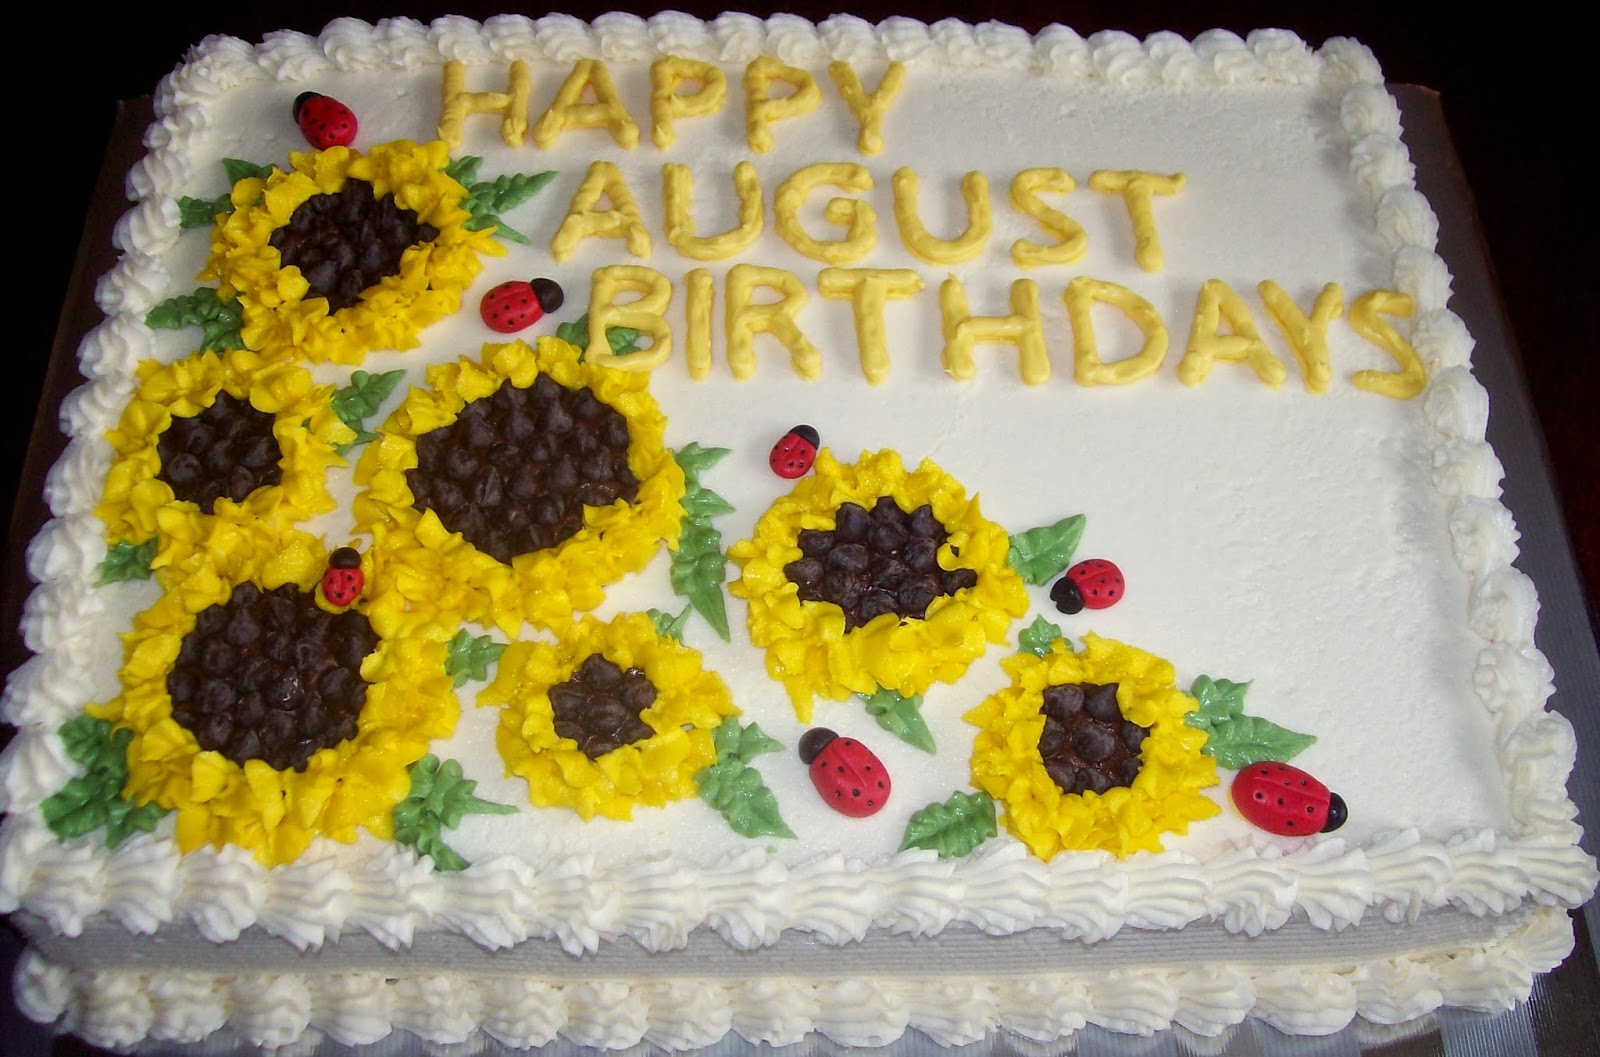 August Birthday Cake August birthdays cake